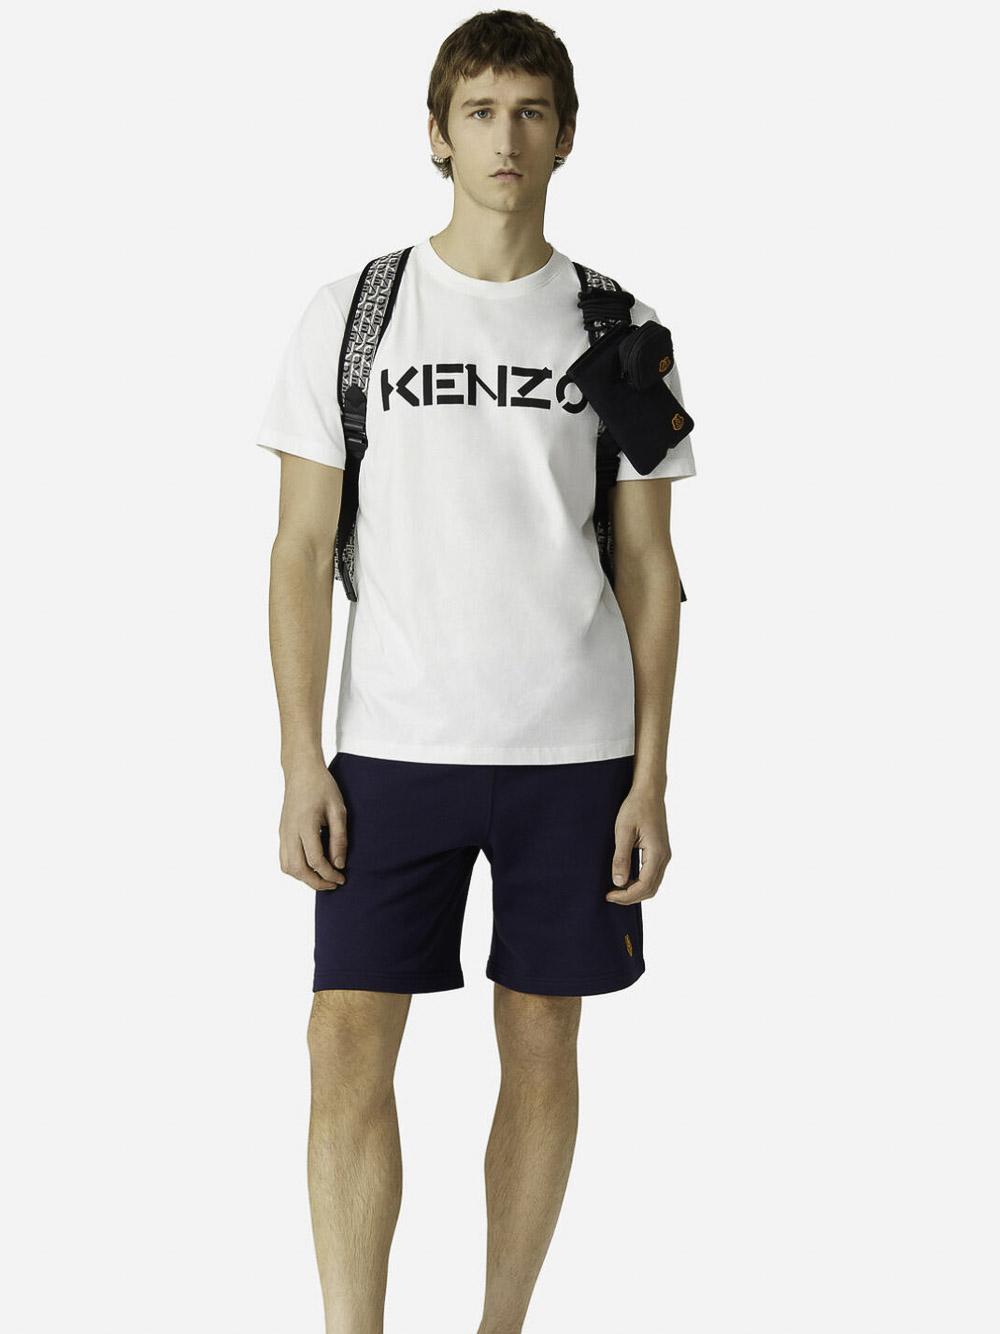 KENZO Μπλούζα t-shirt 5TS0004SJ-01Β ΛΕΥΚΟ